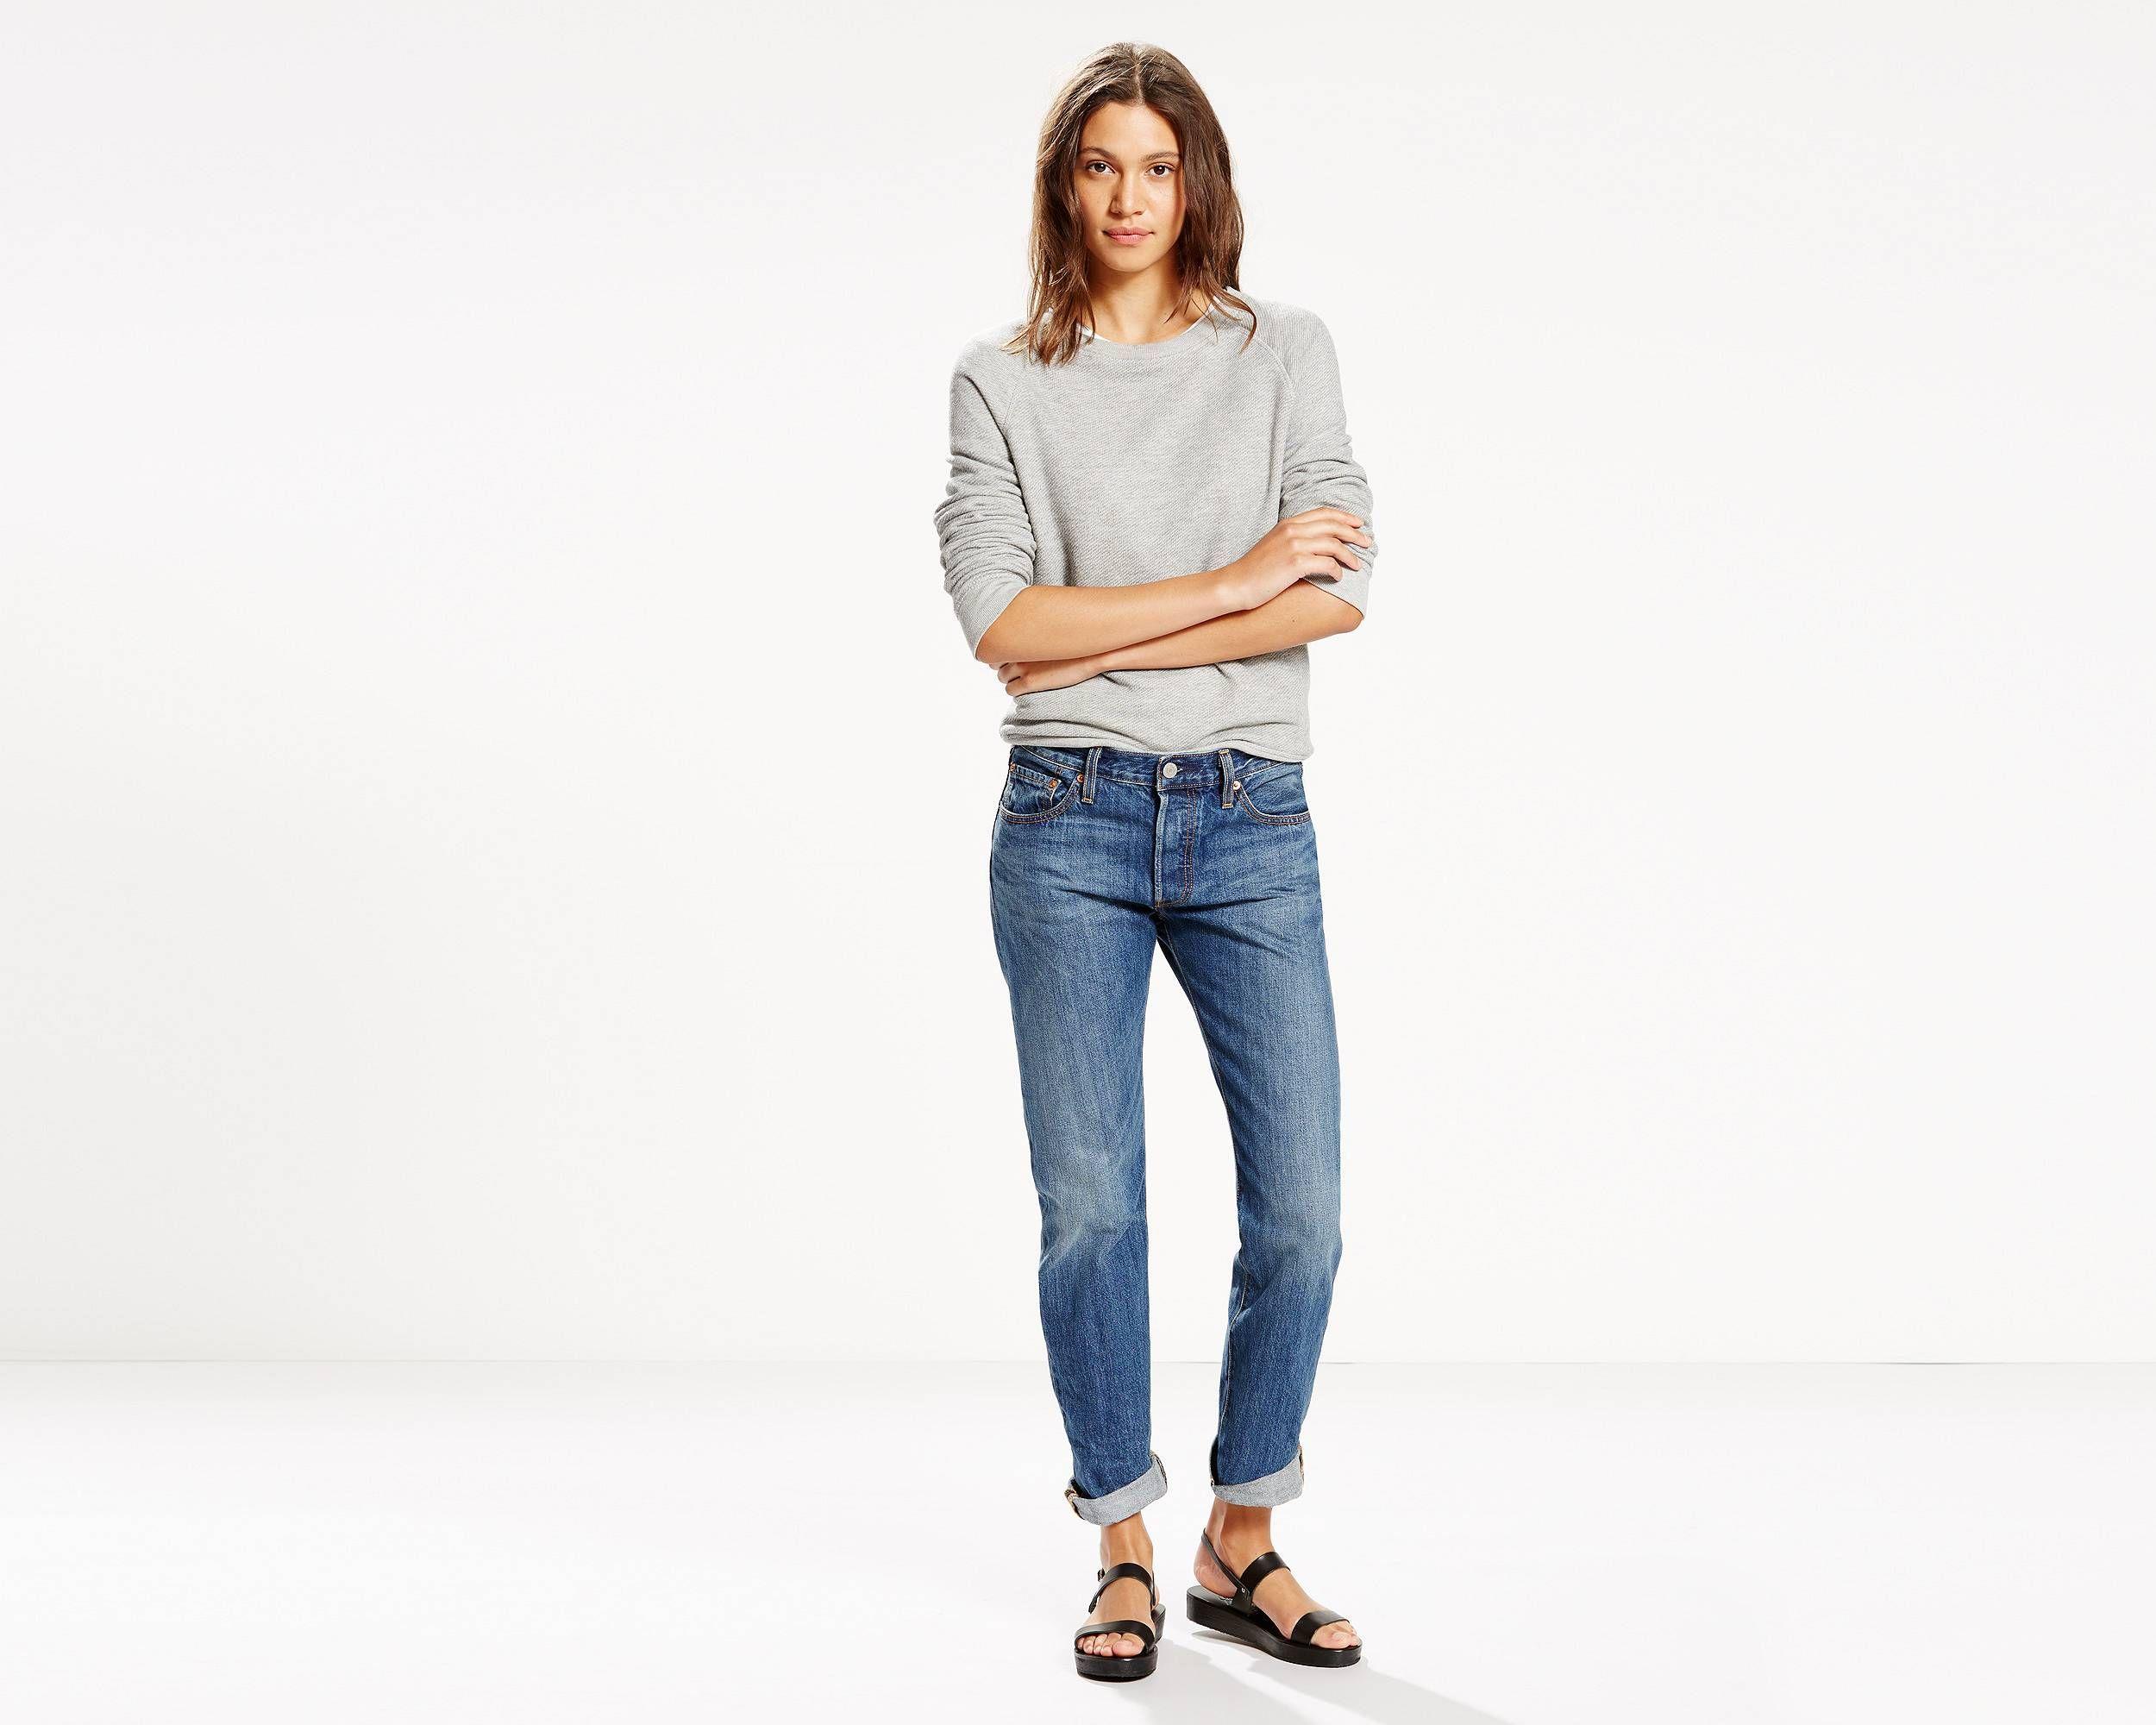 501® Original Fit Jeans For Women - Medium Wash